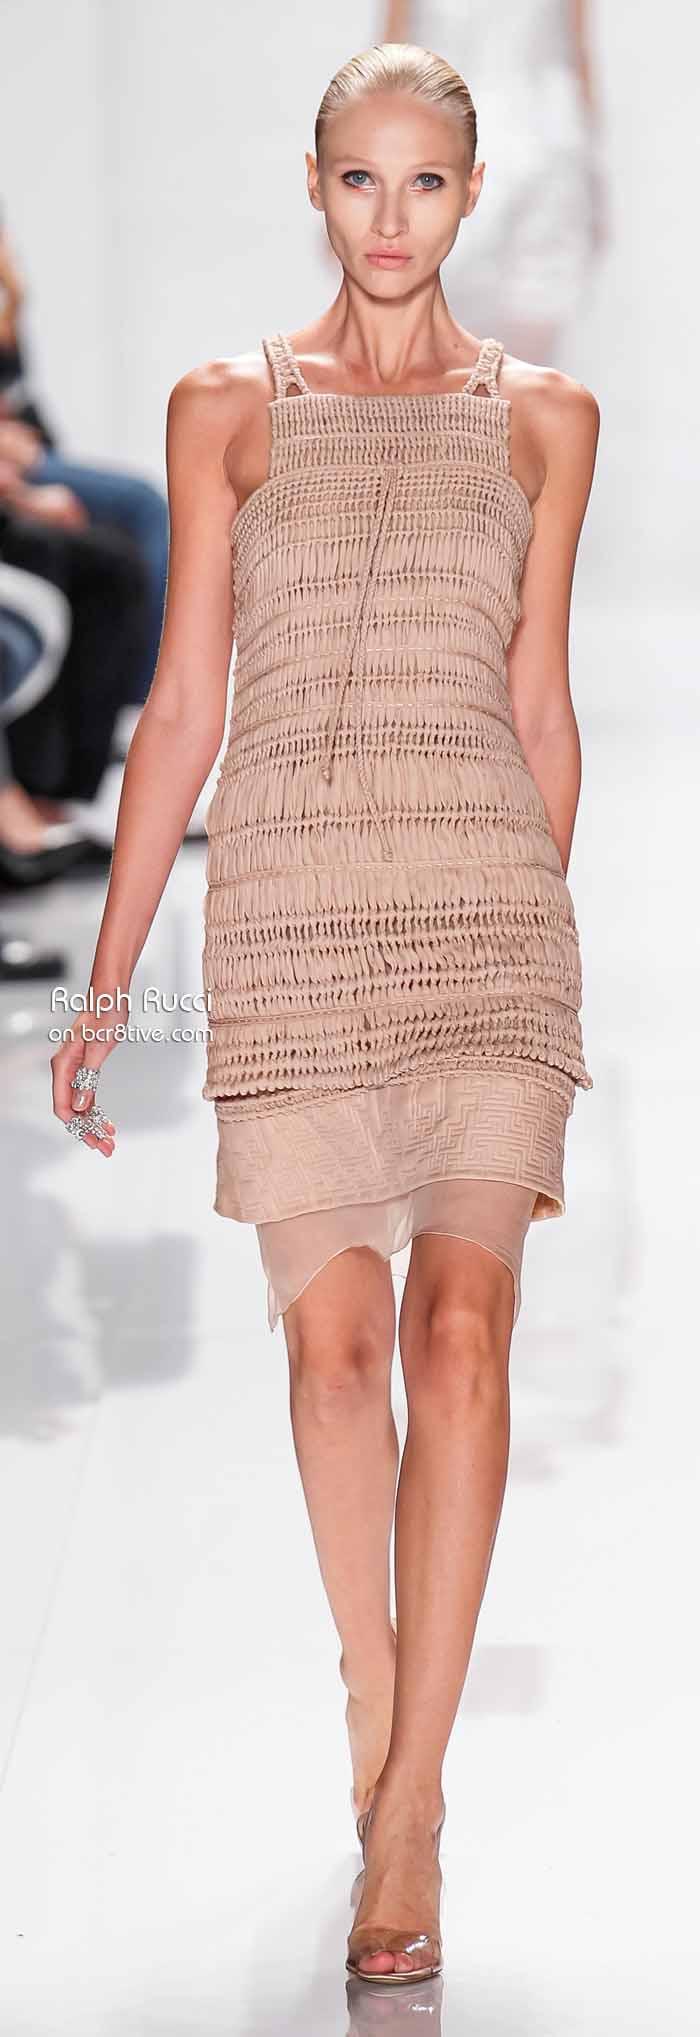 Ralph Rucci Spring 2014 #NYFW - Macrame Dress